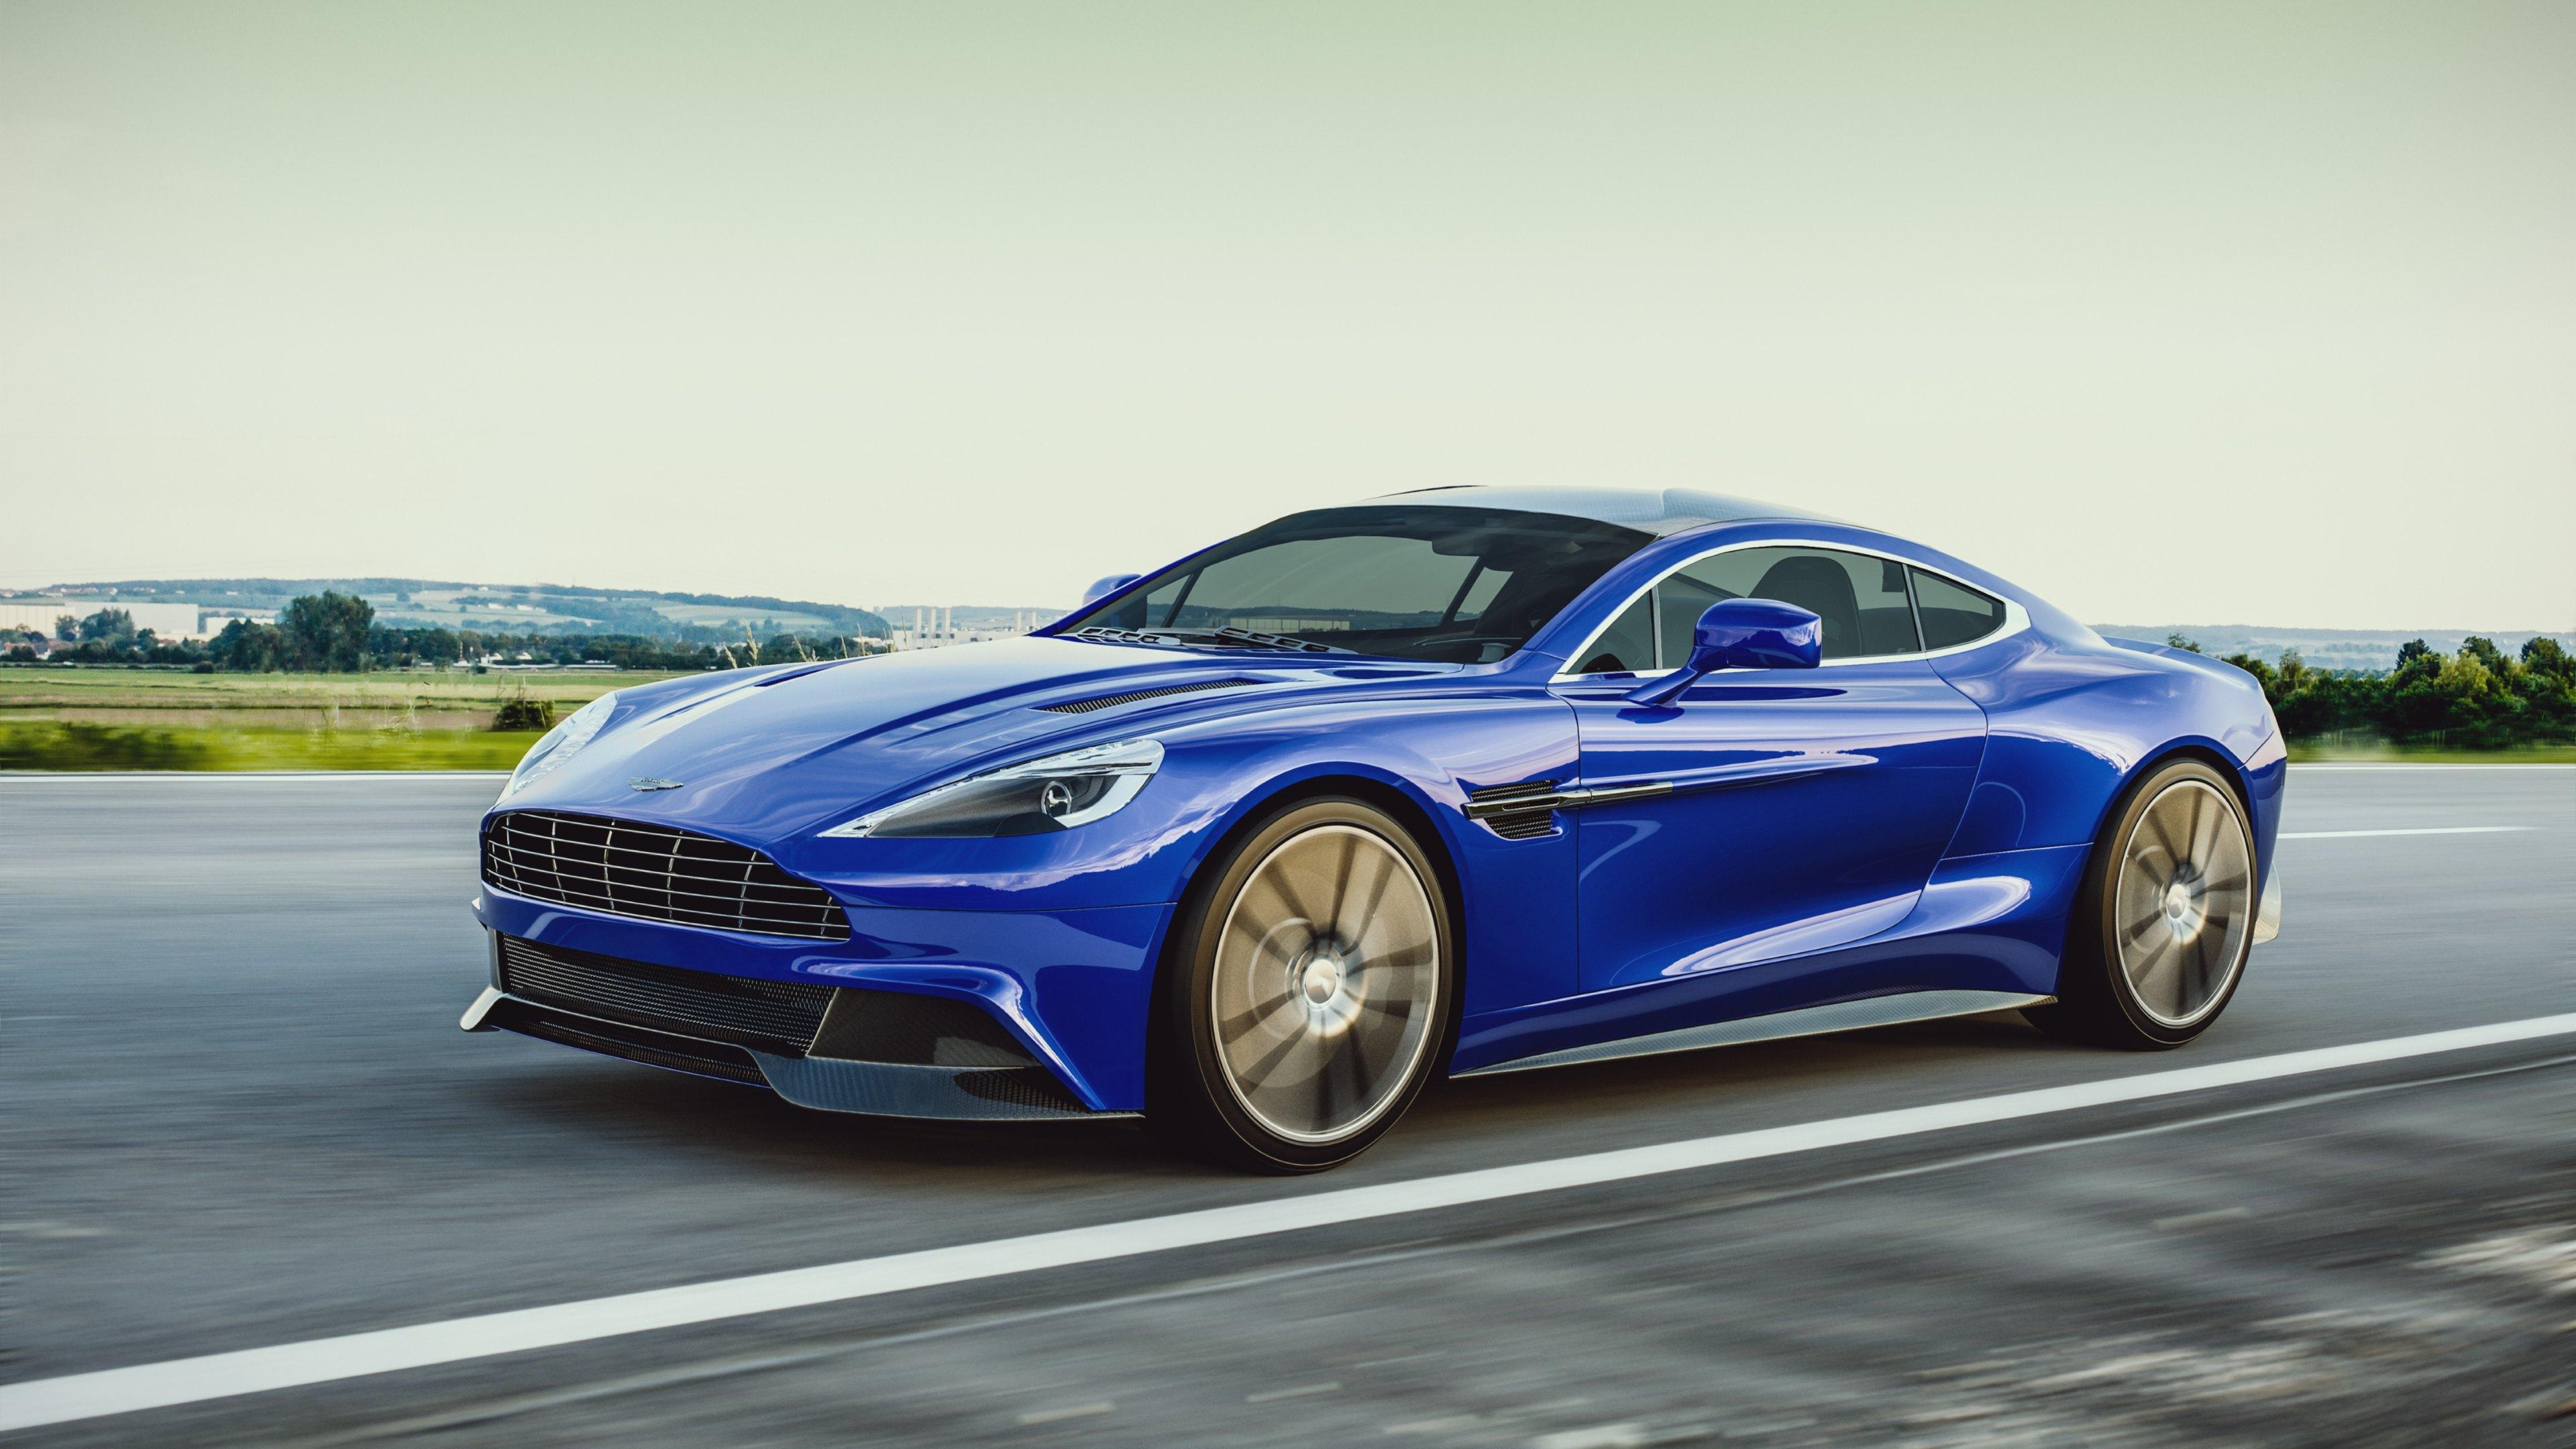 Car   Blue   Aston Martin Vanquish   Wallpaper 3840x2160